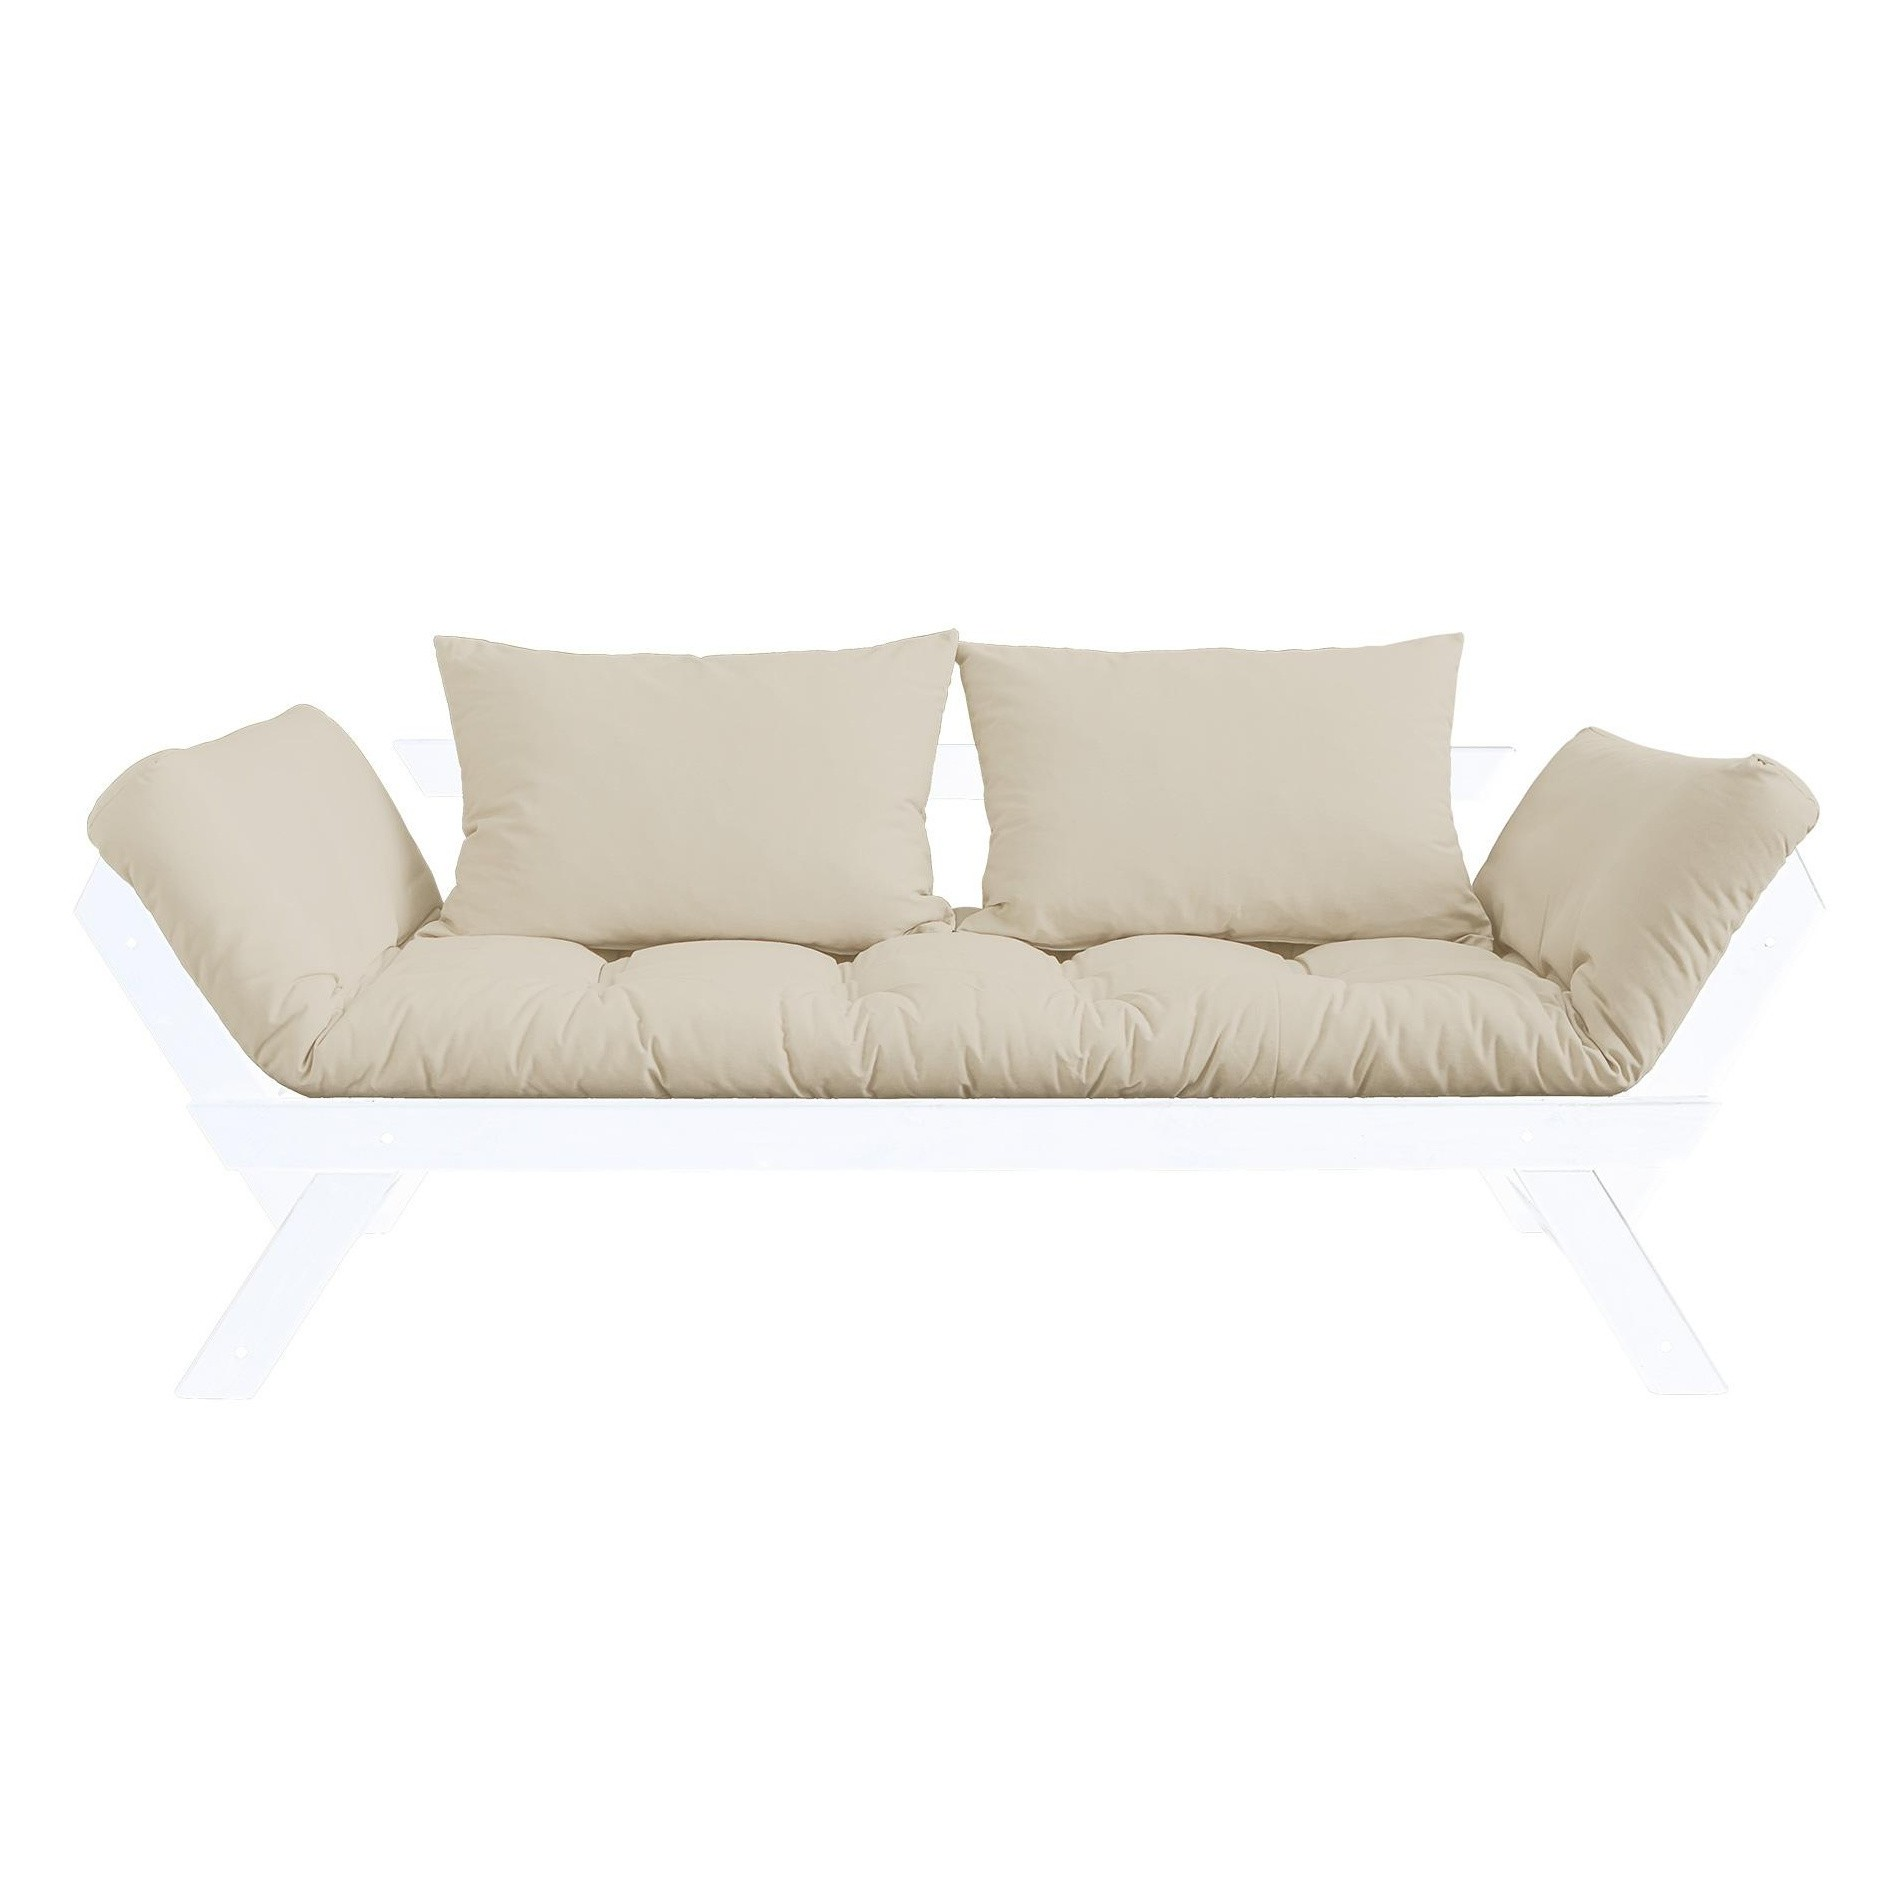 bebop sofa bed white laquered pine base ambientedirect rh ambientedirect com